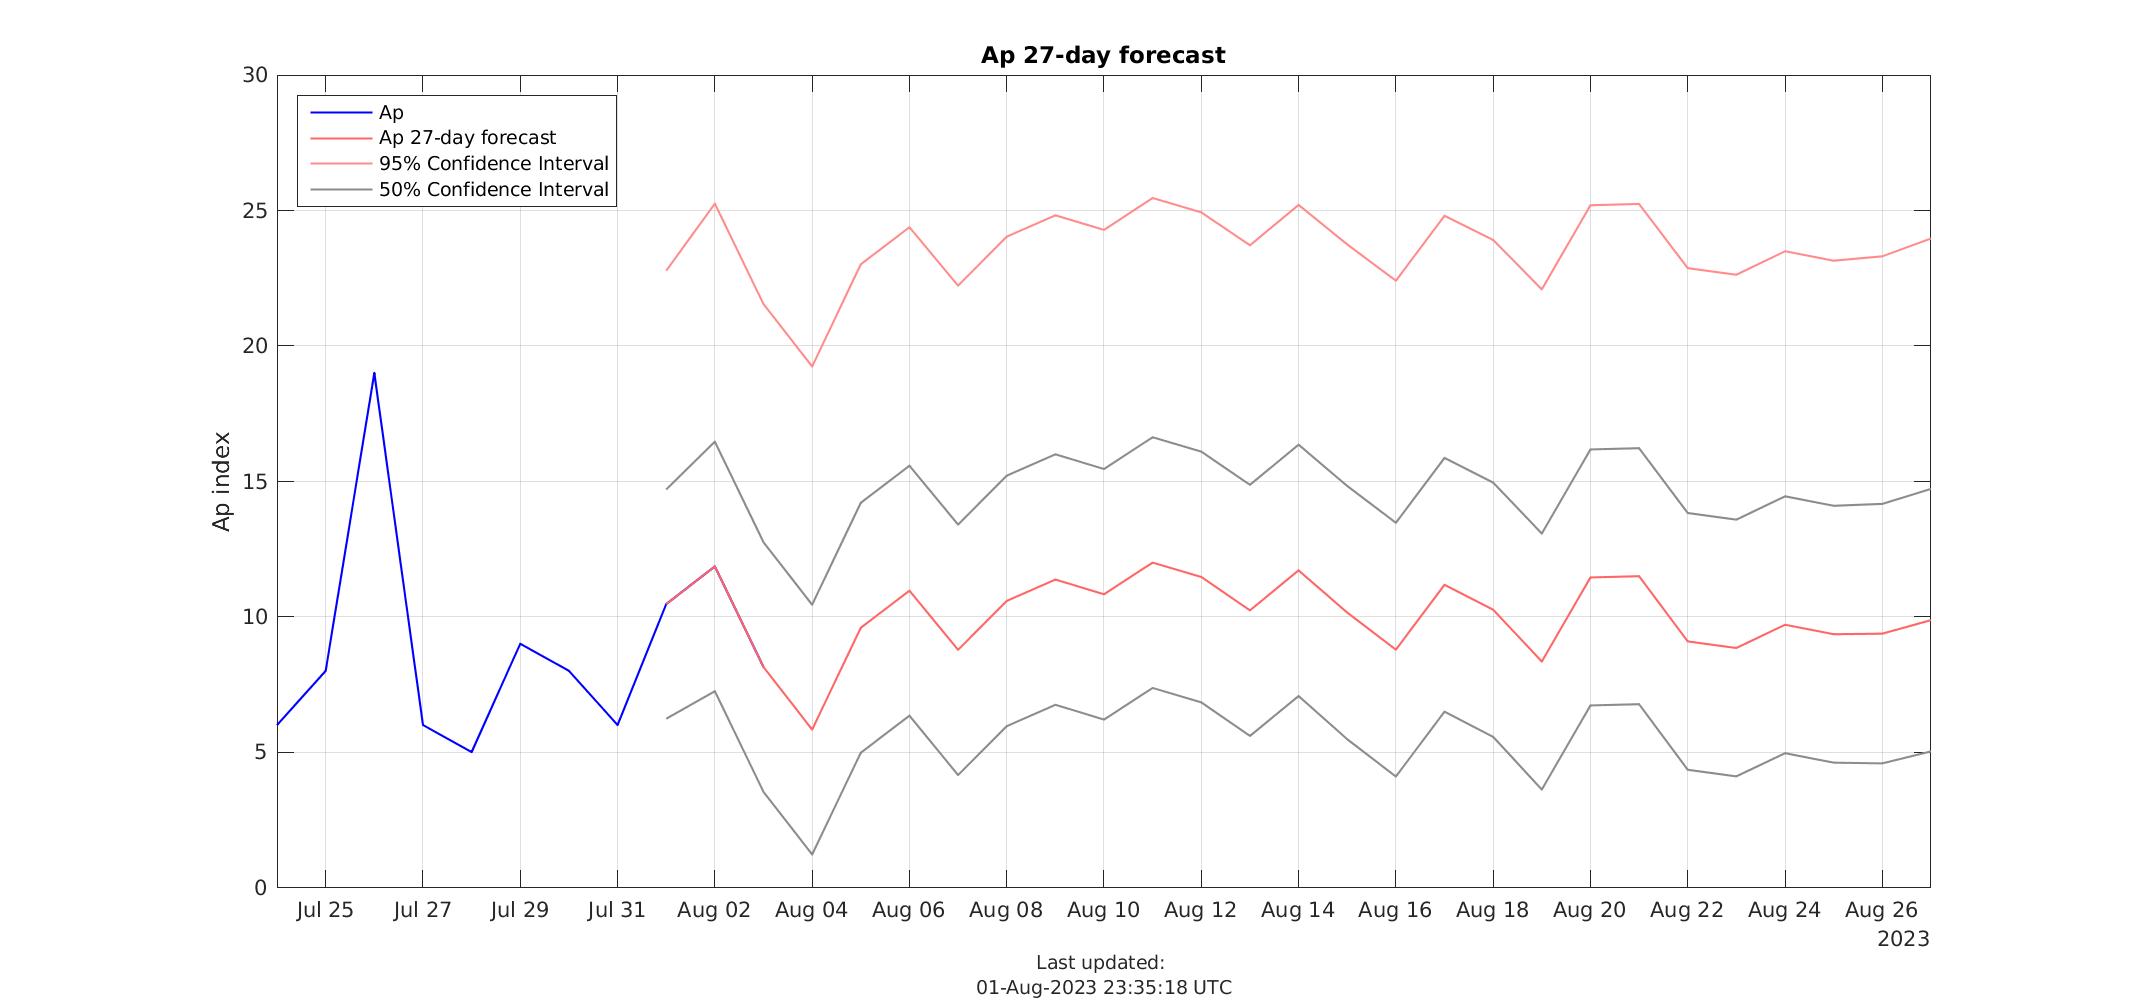 Ap 27-day Forecast